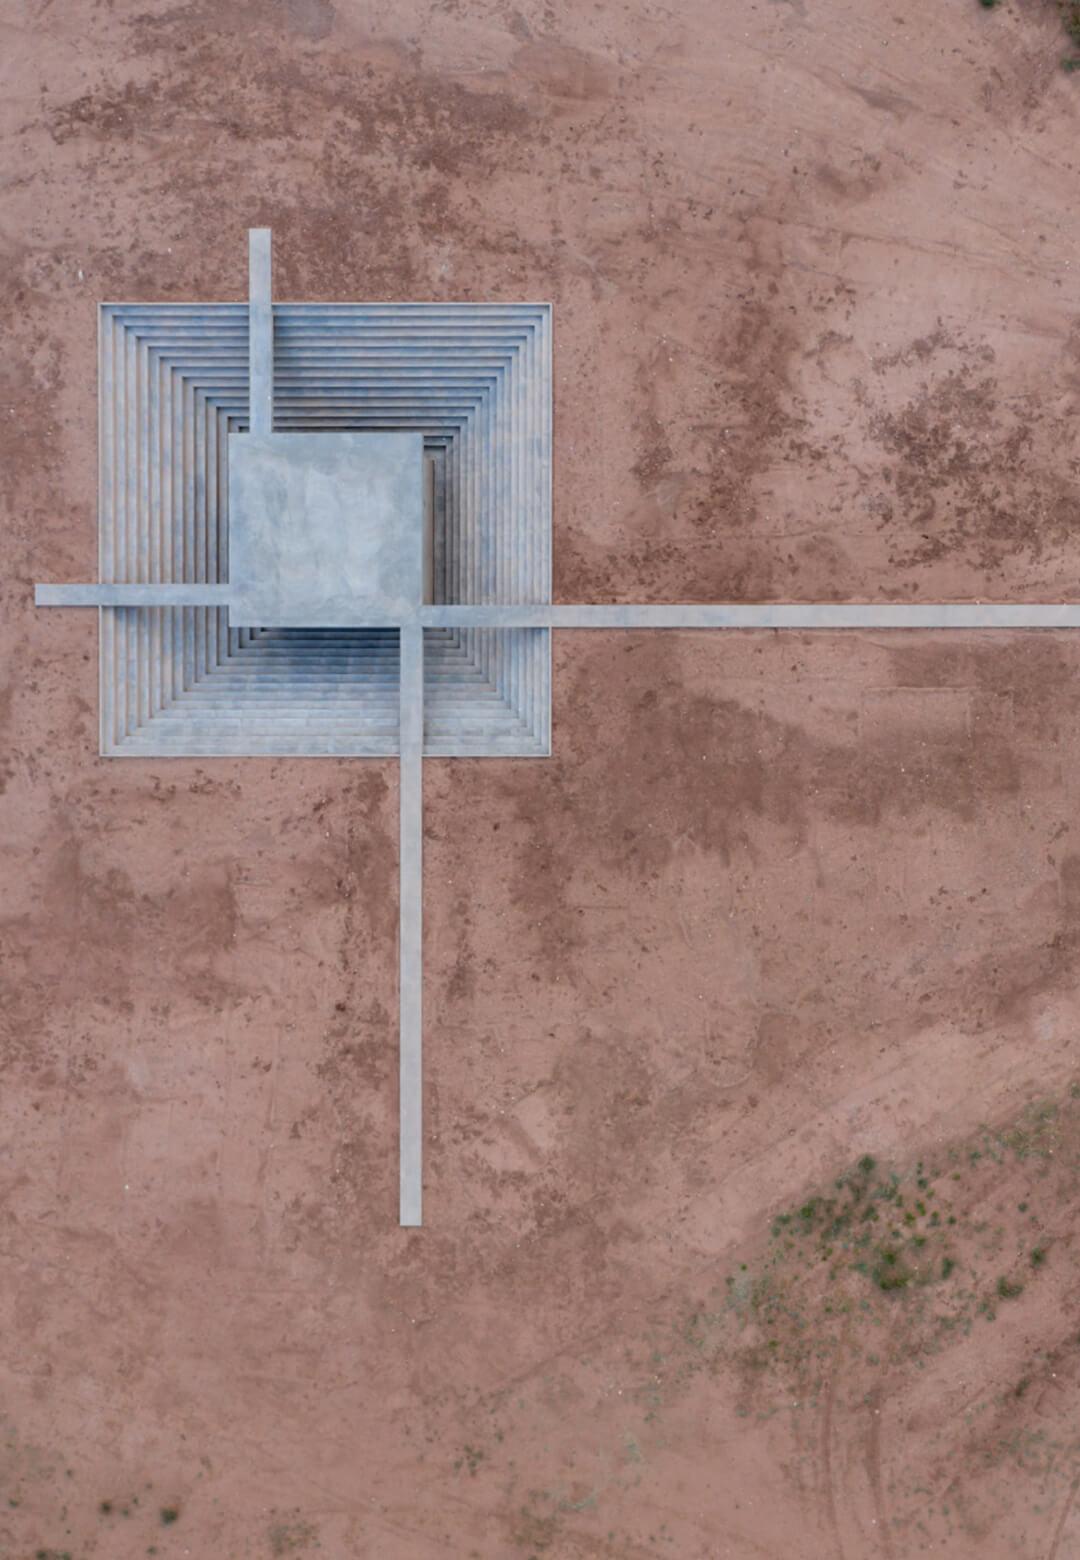 Aerial view of McNeal 020 | McNeal 020 | David Telerman | STIRworld